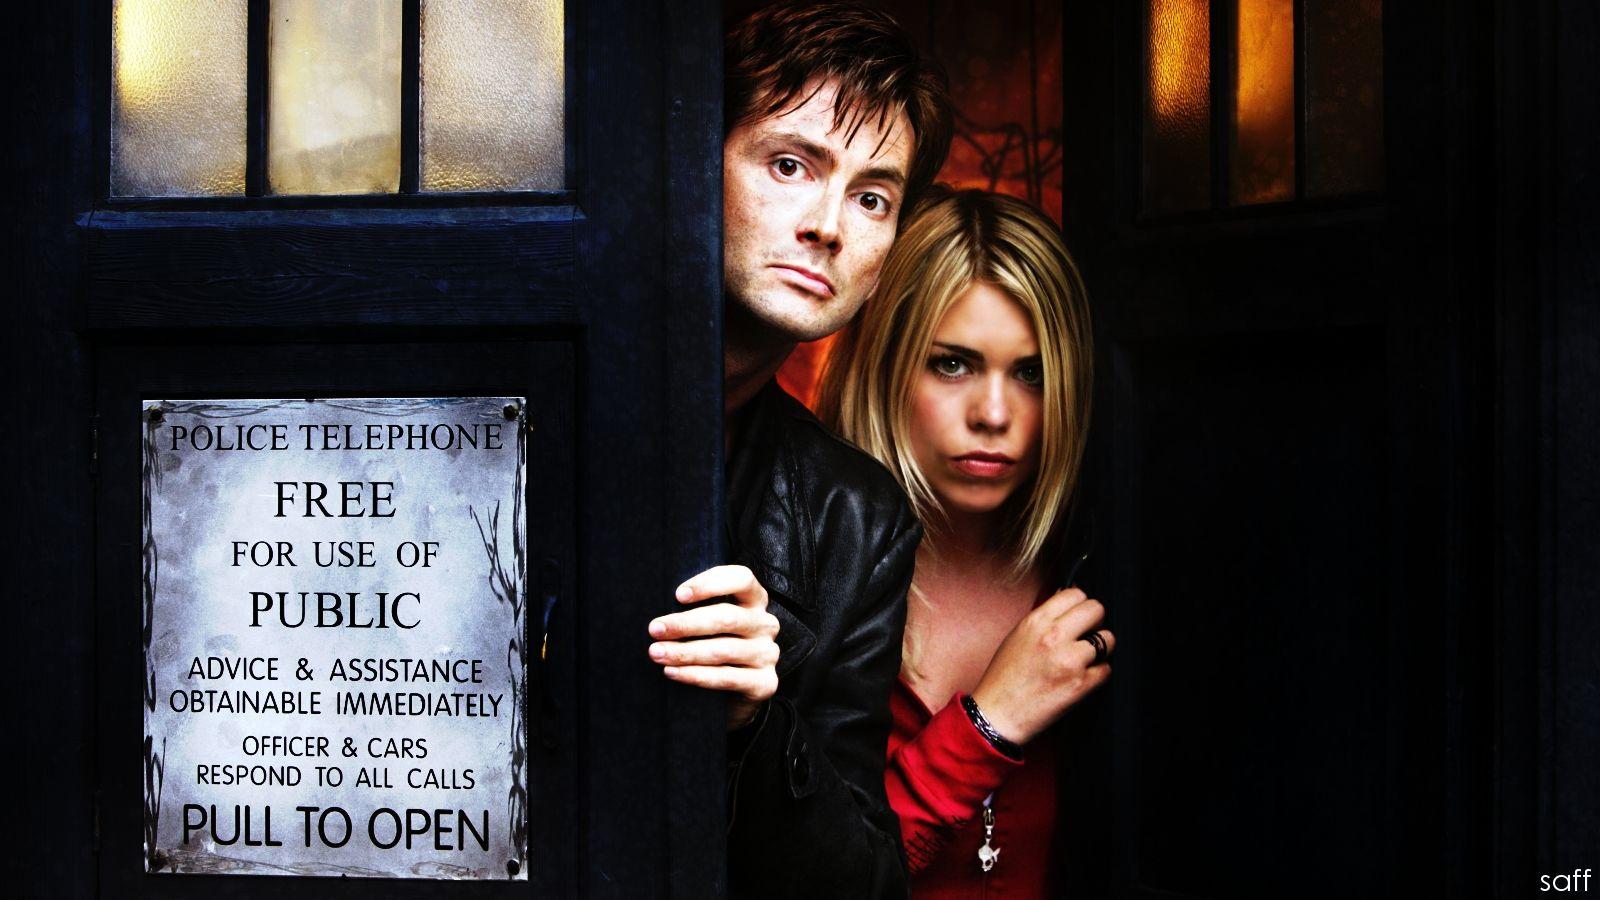 Doctor Who wallpaper by saffiremoon21.deviantart.com on @deviantART